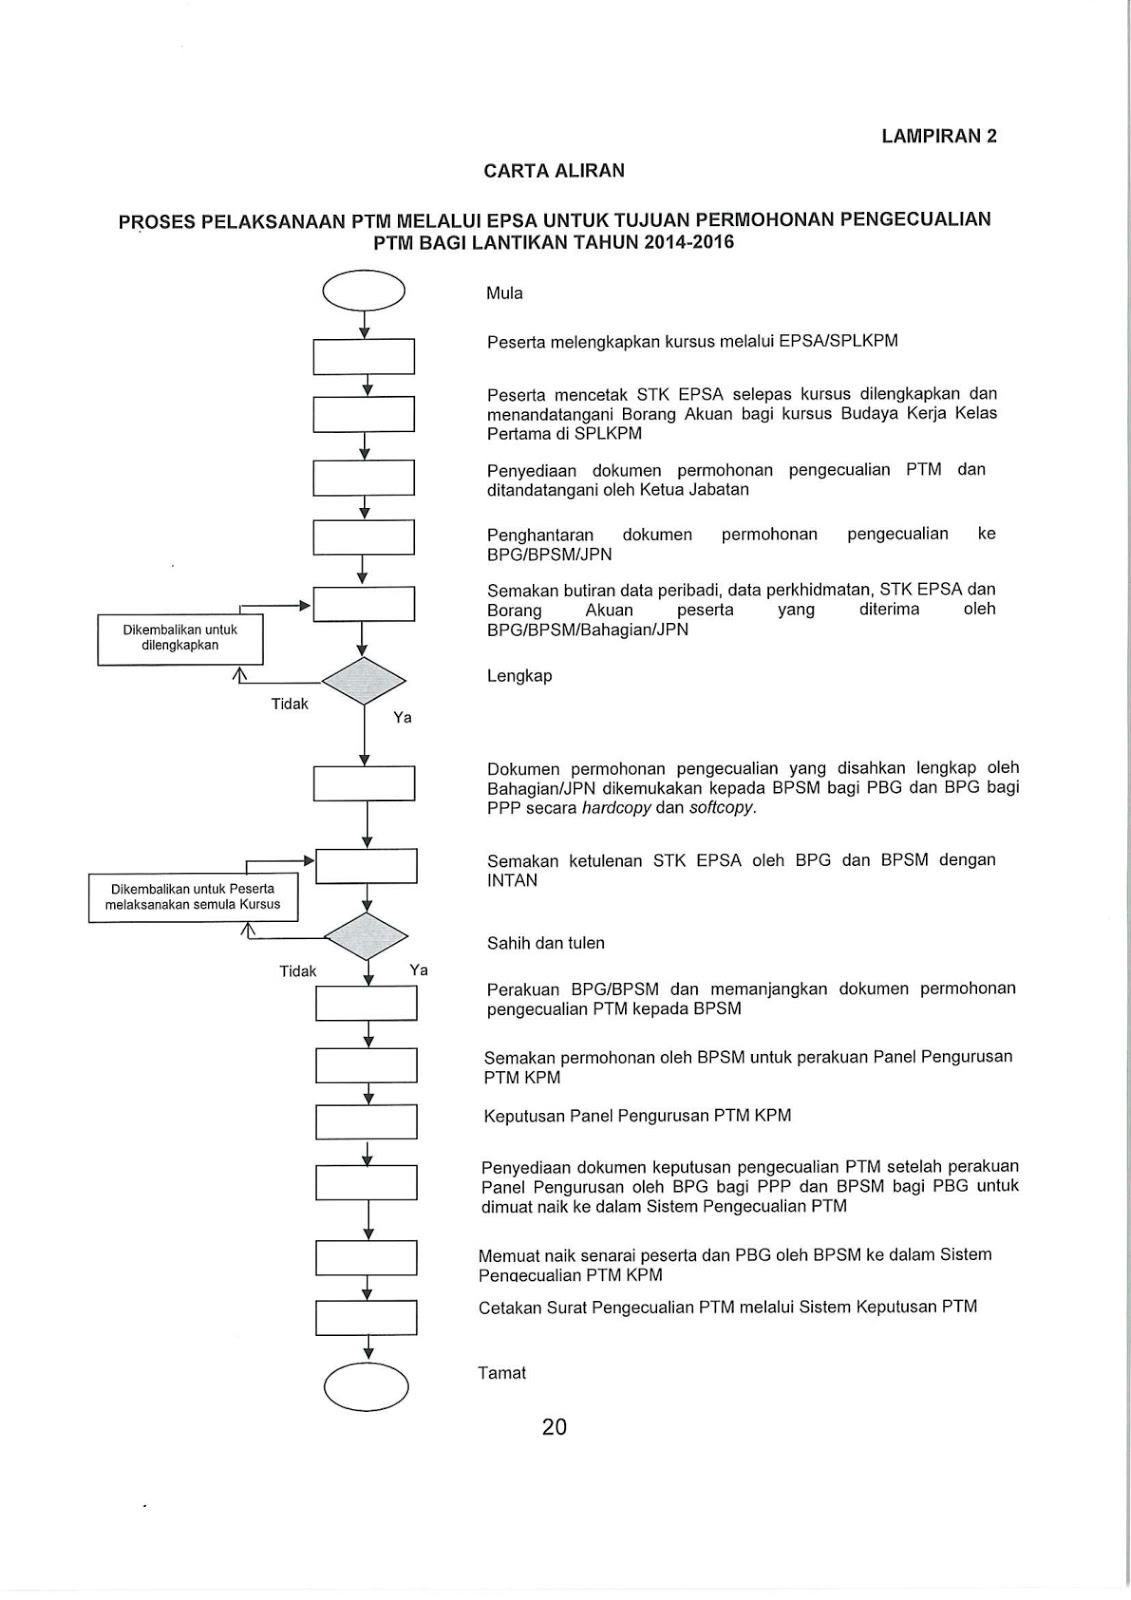 Carta aliran PTM melalui EPSA